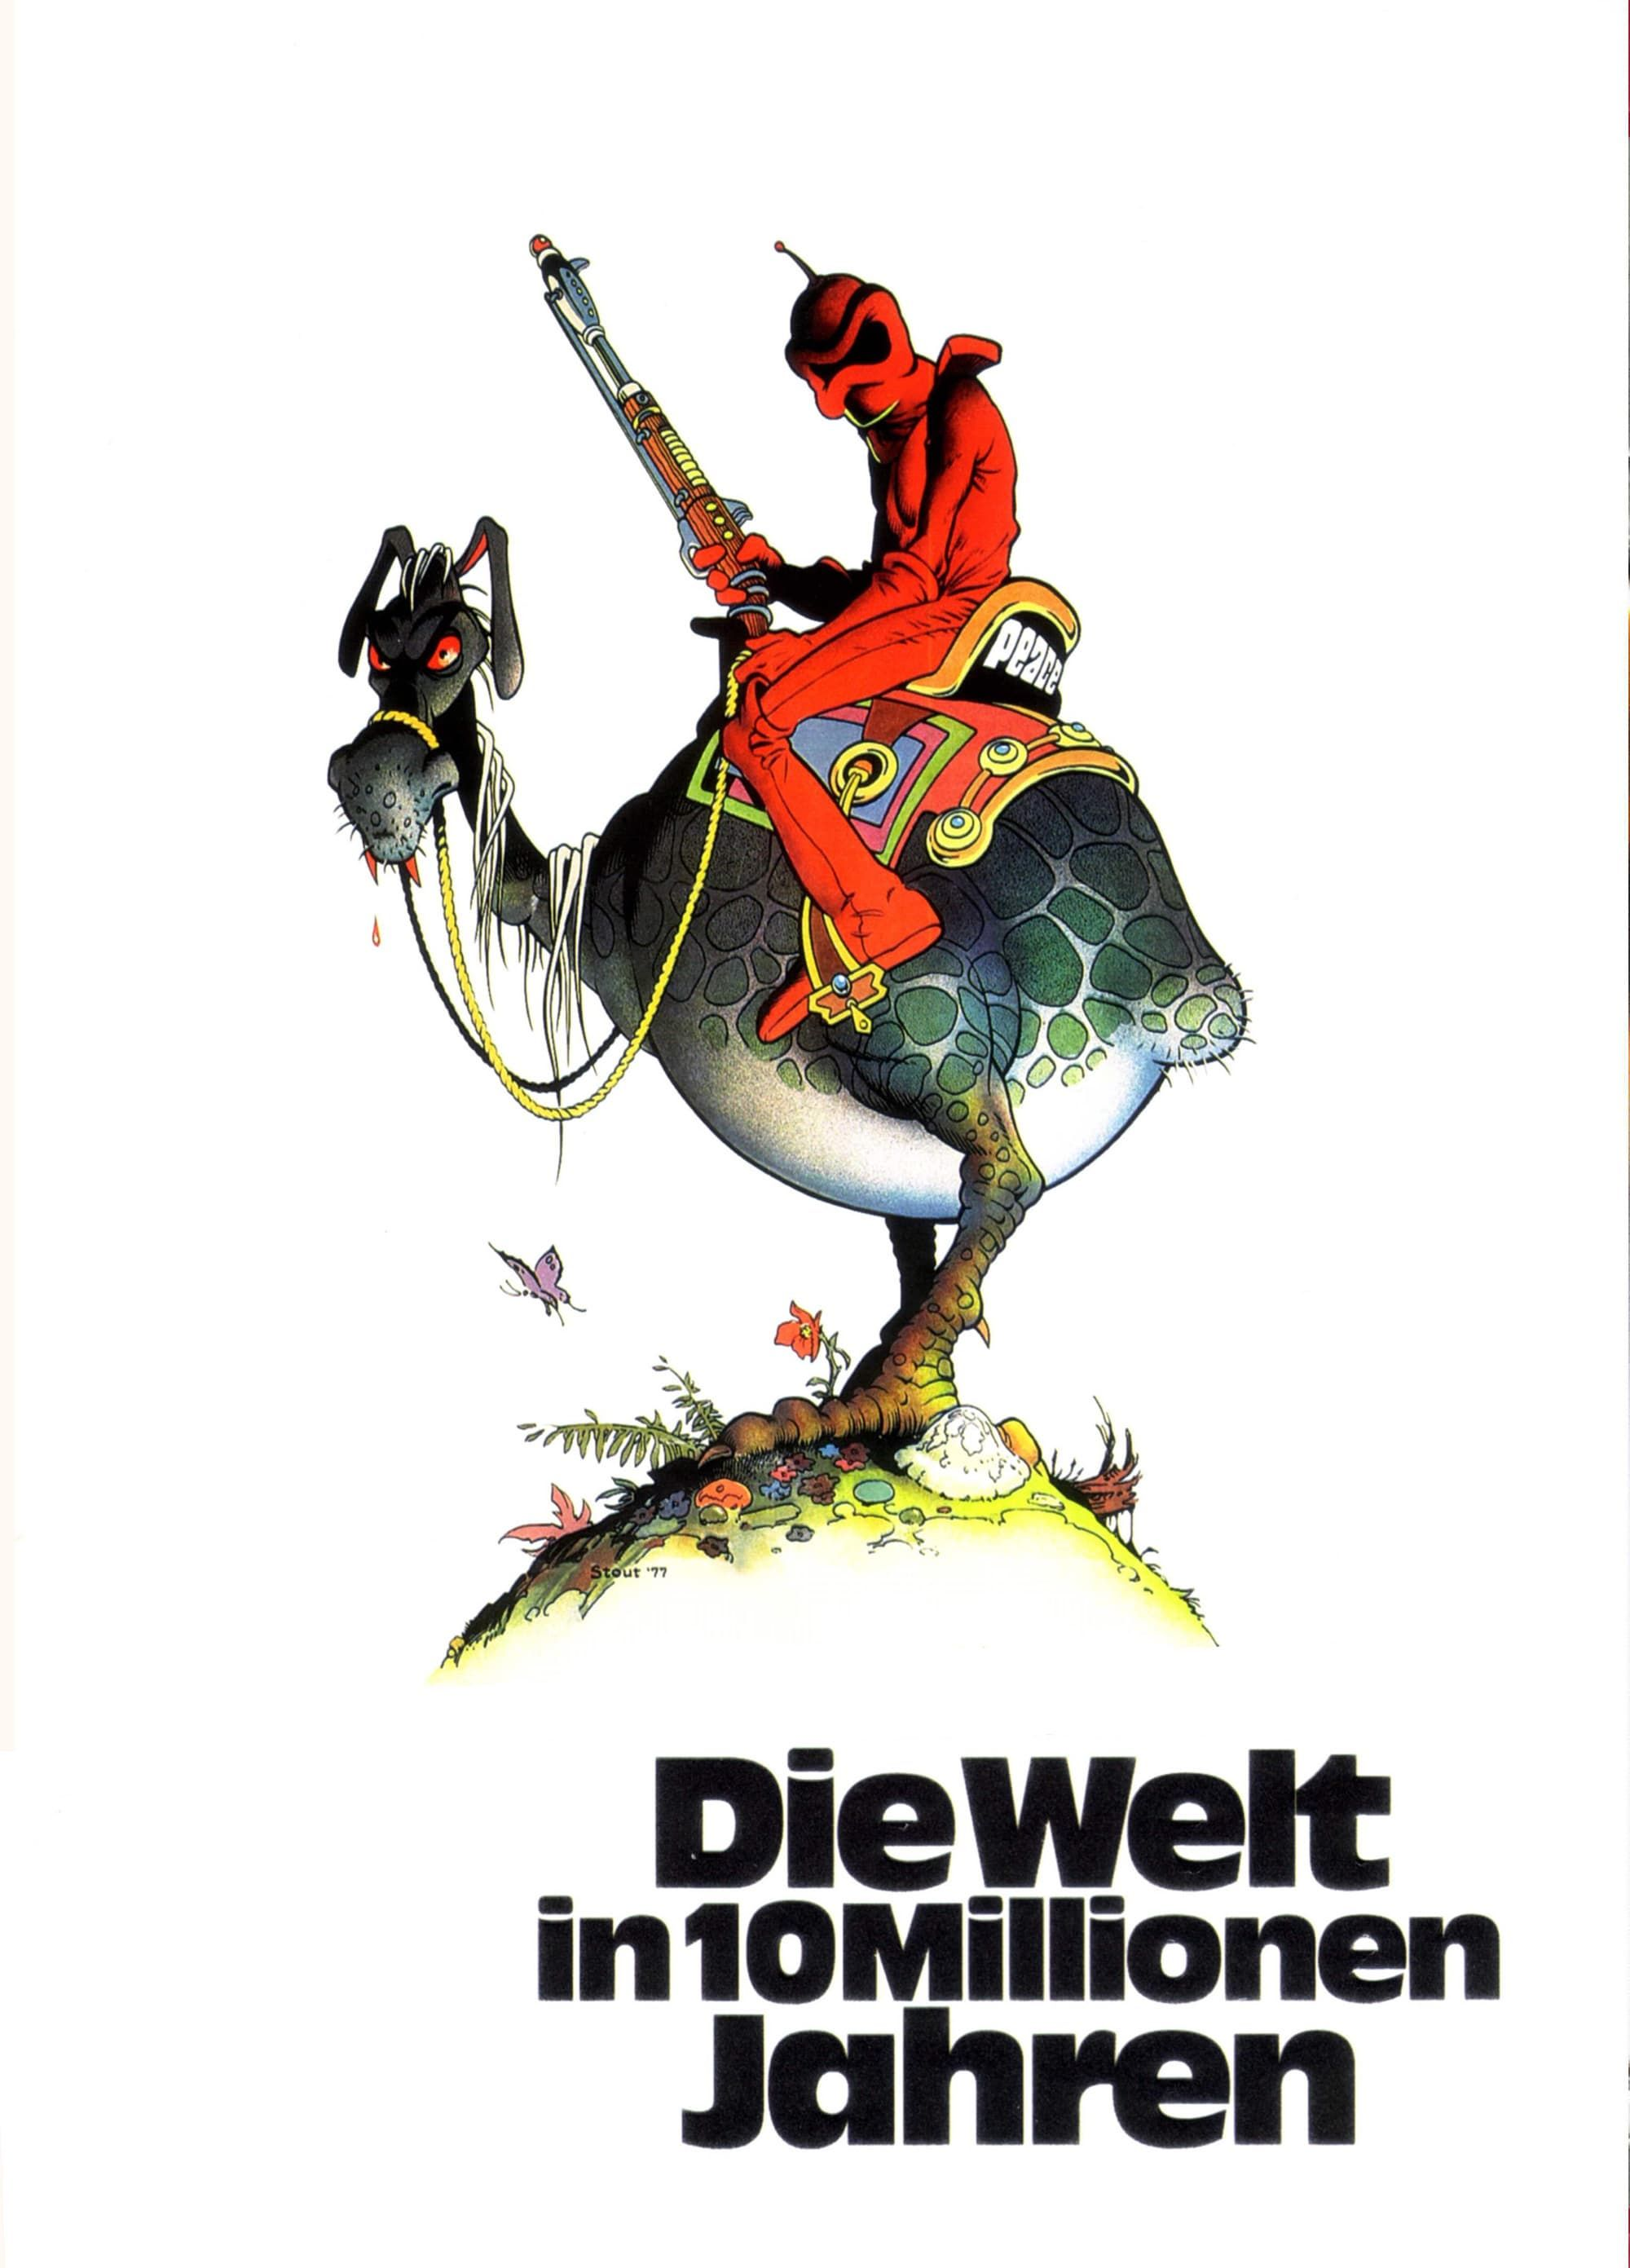 Utorrent Ver Wizards 1977 Pelicula Completa Online En Espanol Latino Full Movies Online Free Full Movies Fun To Be One